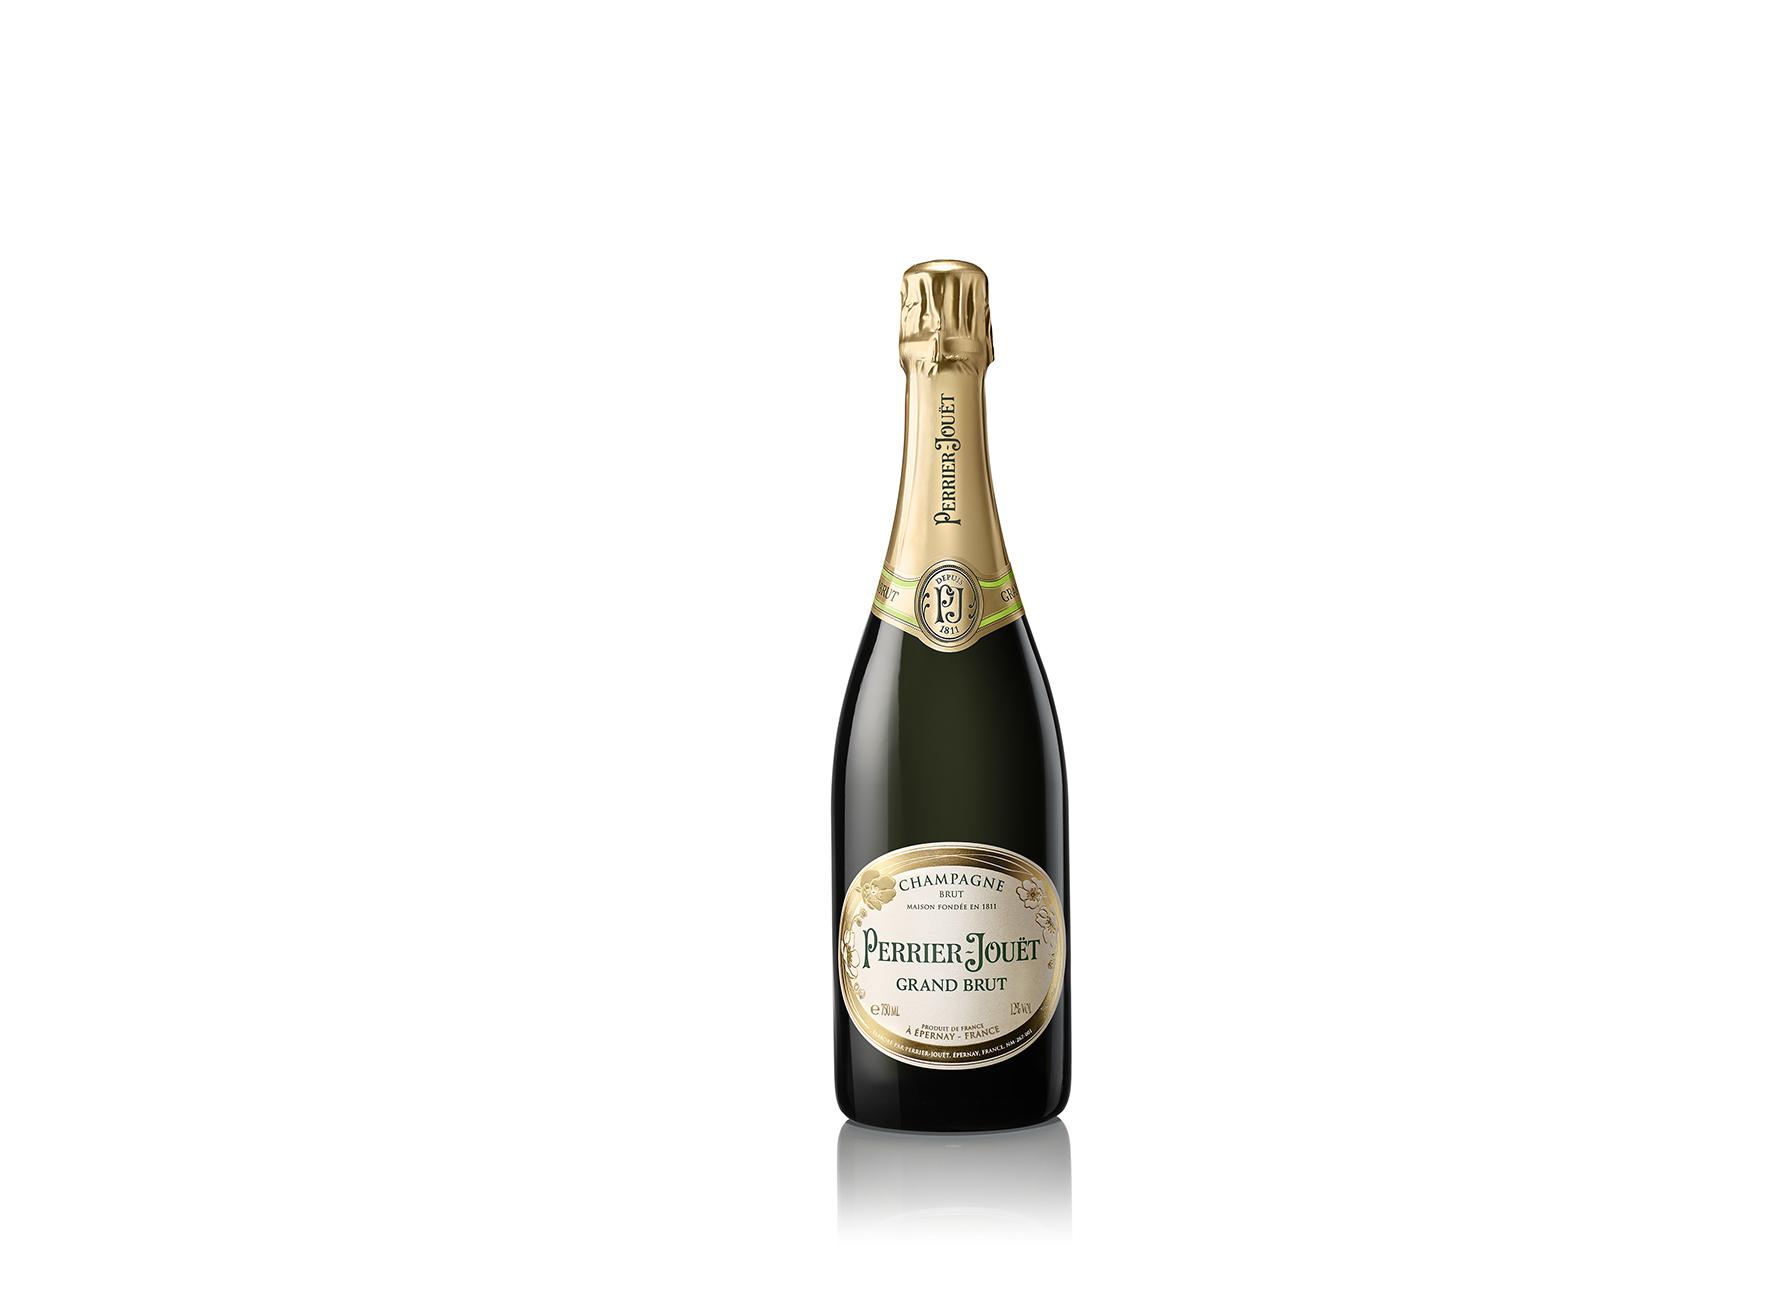 Champagner Perrier Jouet Grand Brut